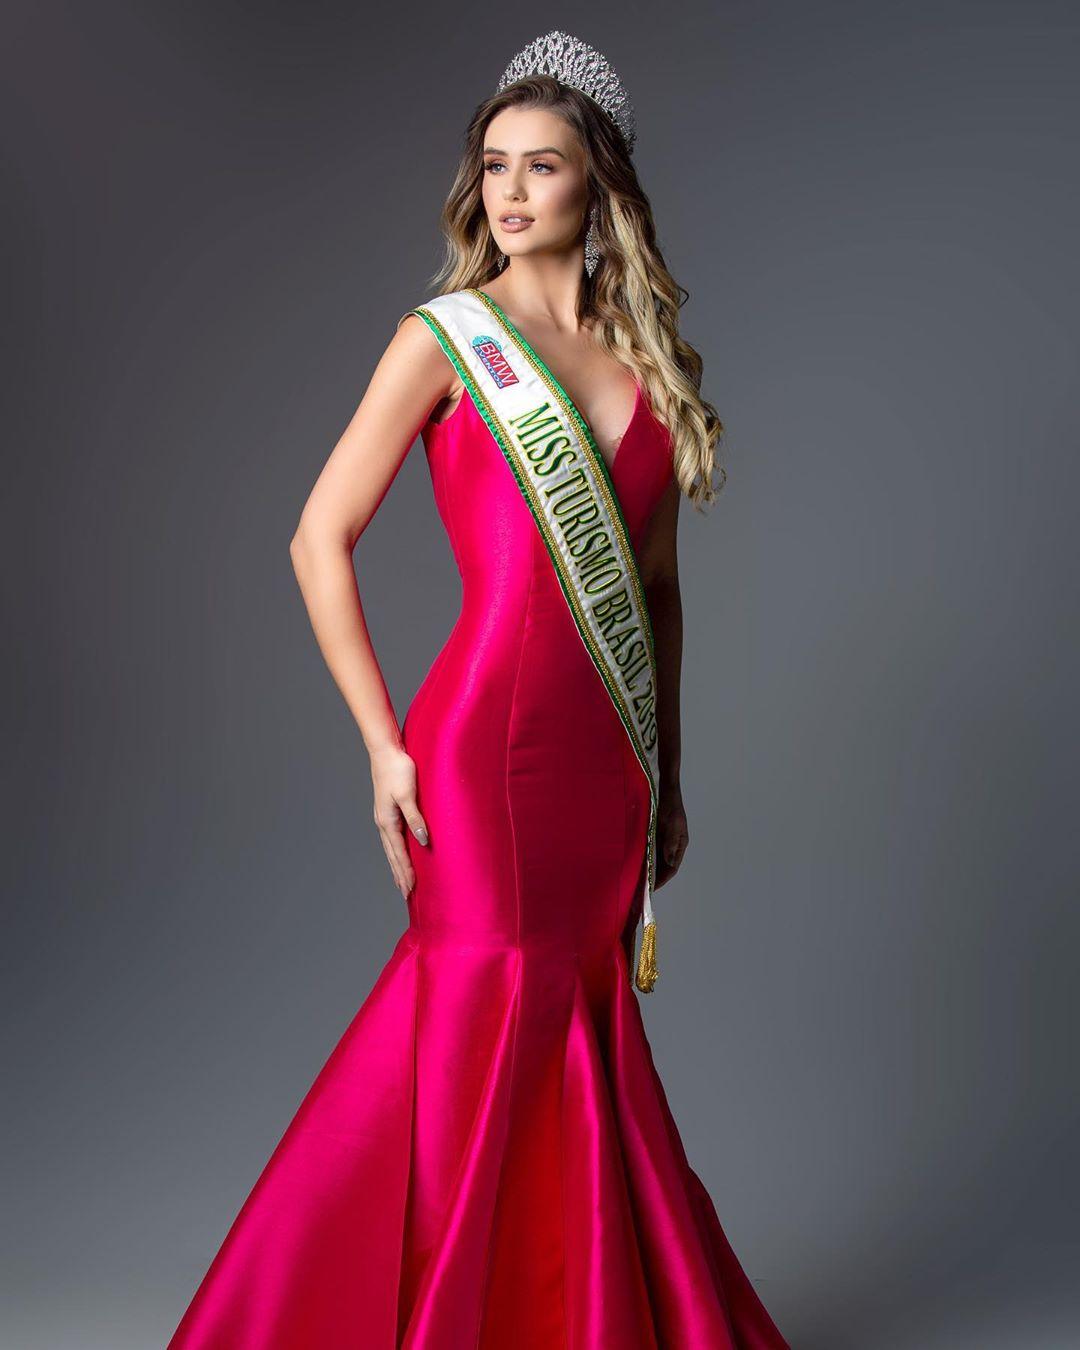 marcella kozinski de barros, 3rd runner-up de miss tourism world 2019. 67703510